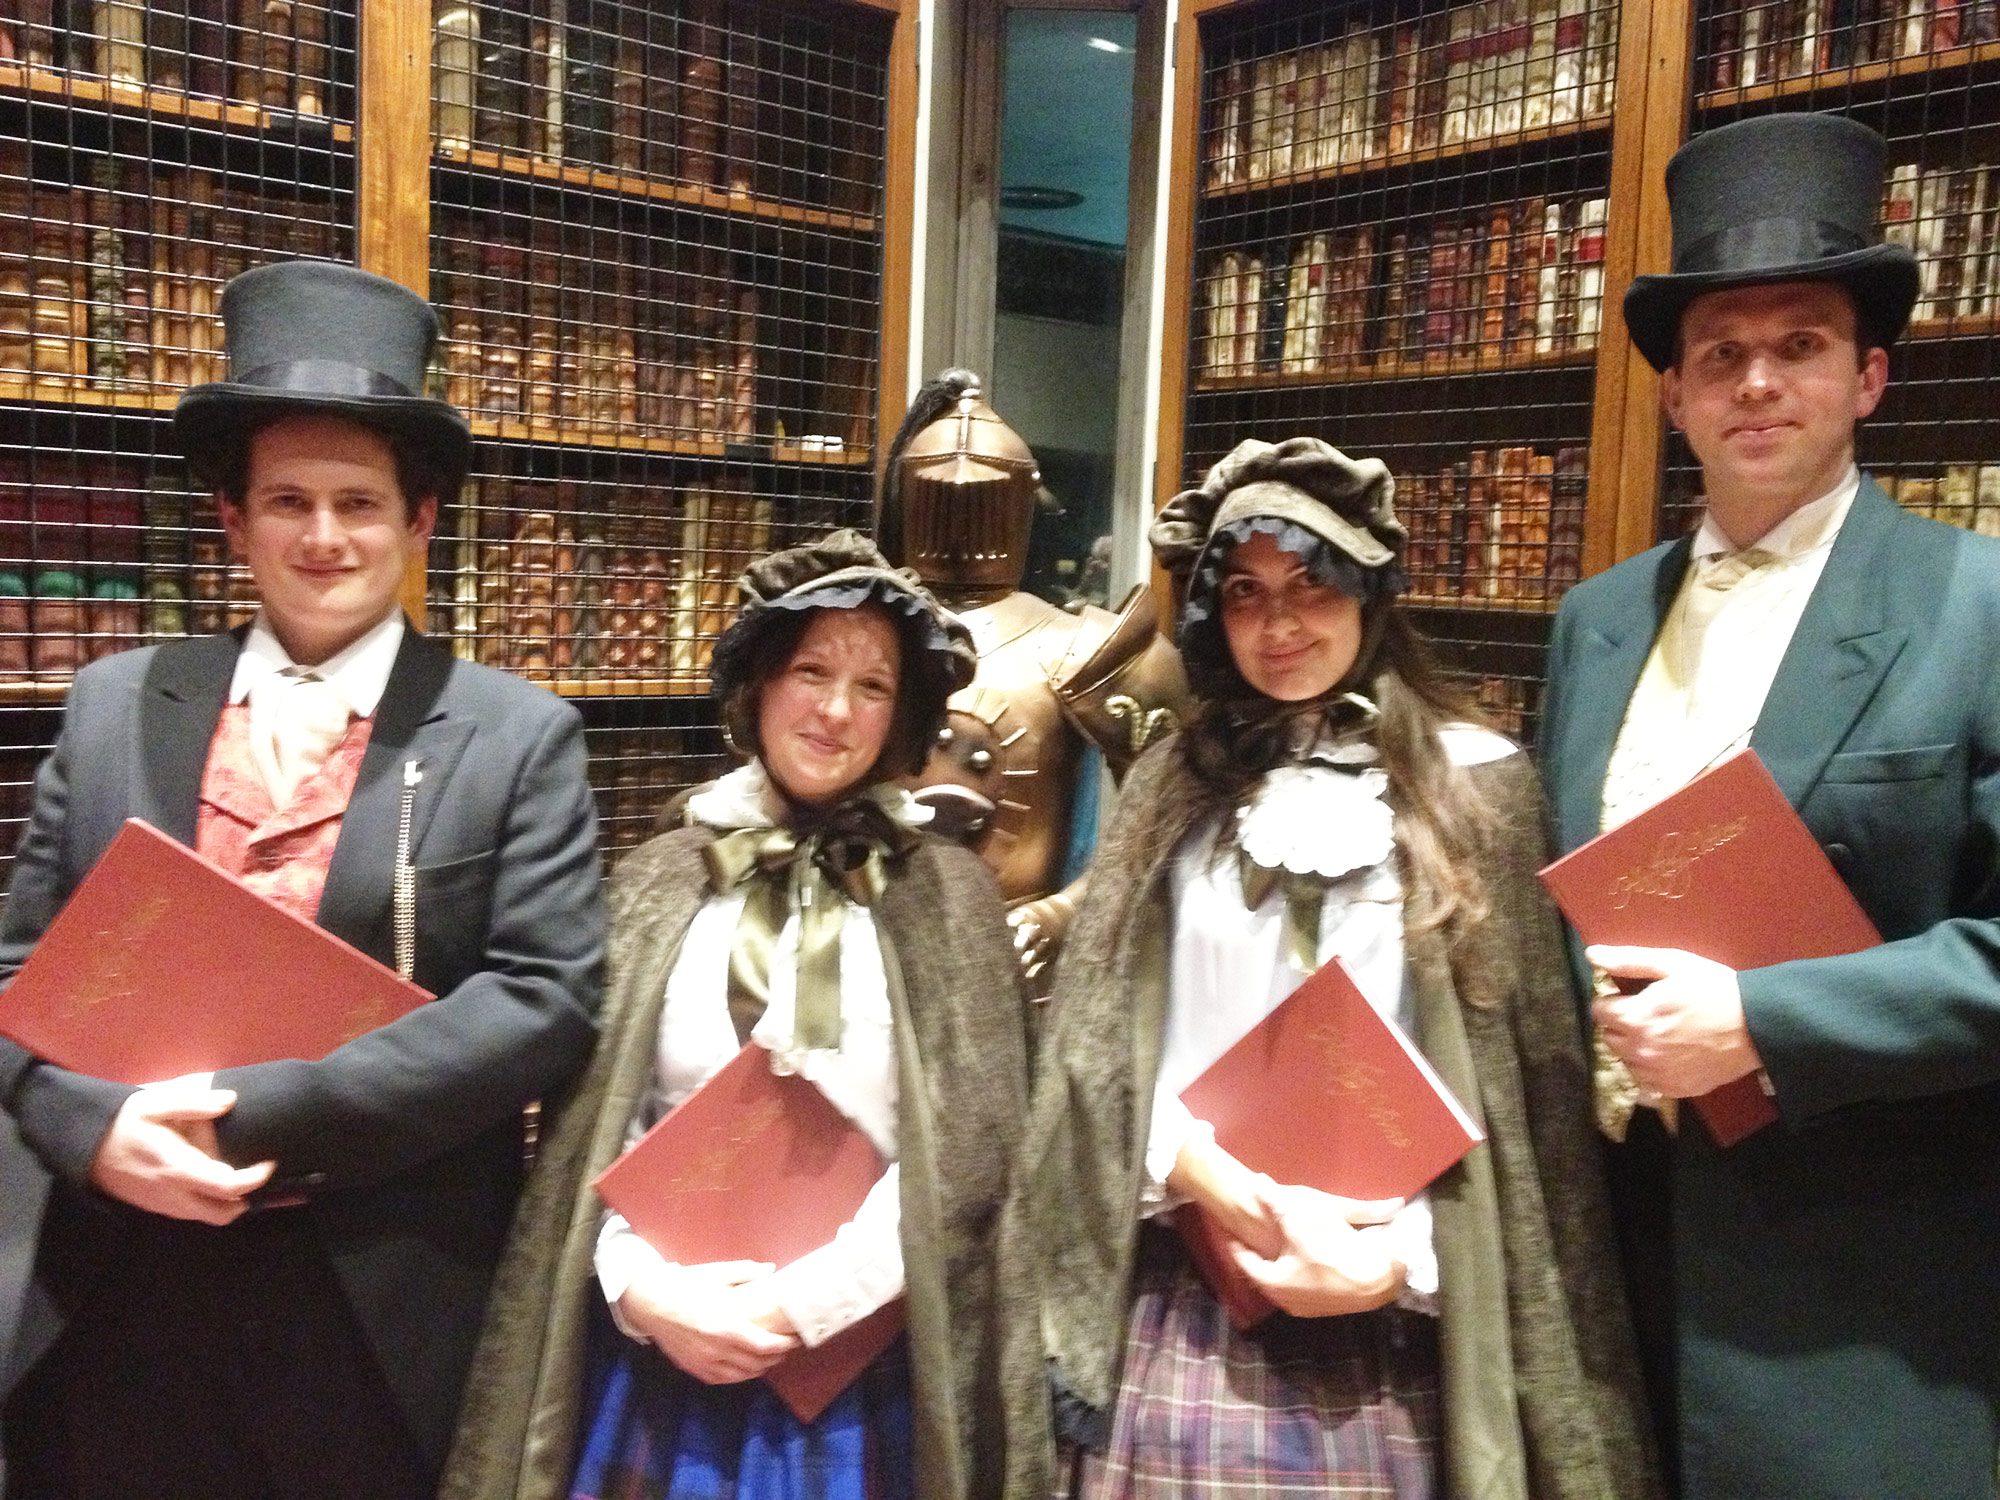 The London Carol Singers Christmas Entertainment Victorian Carolers